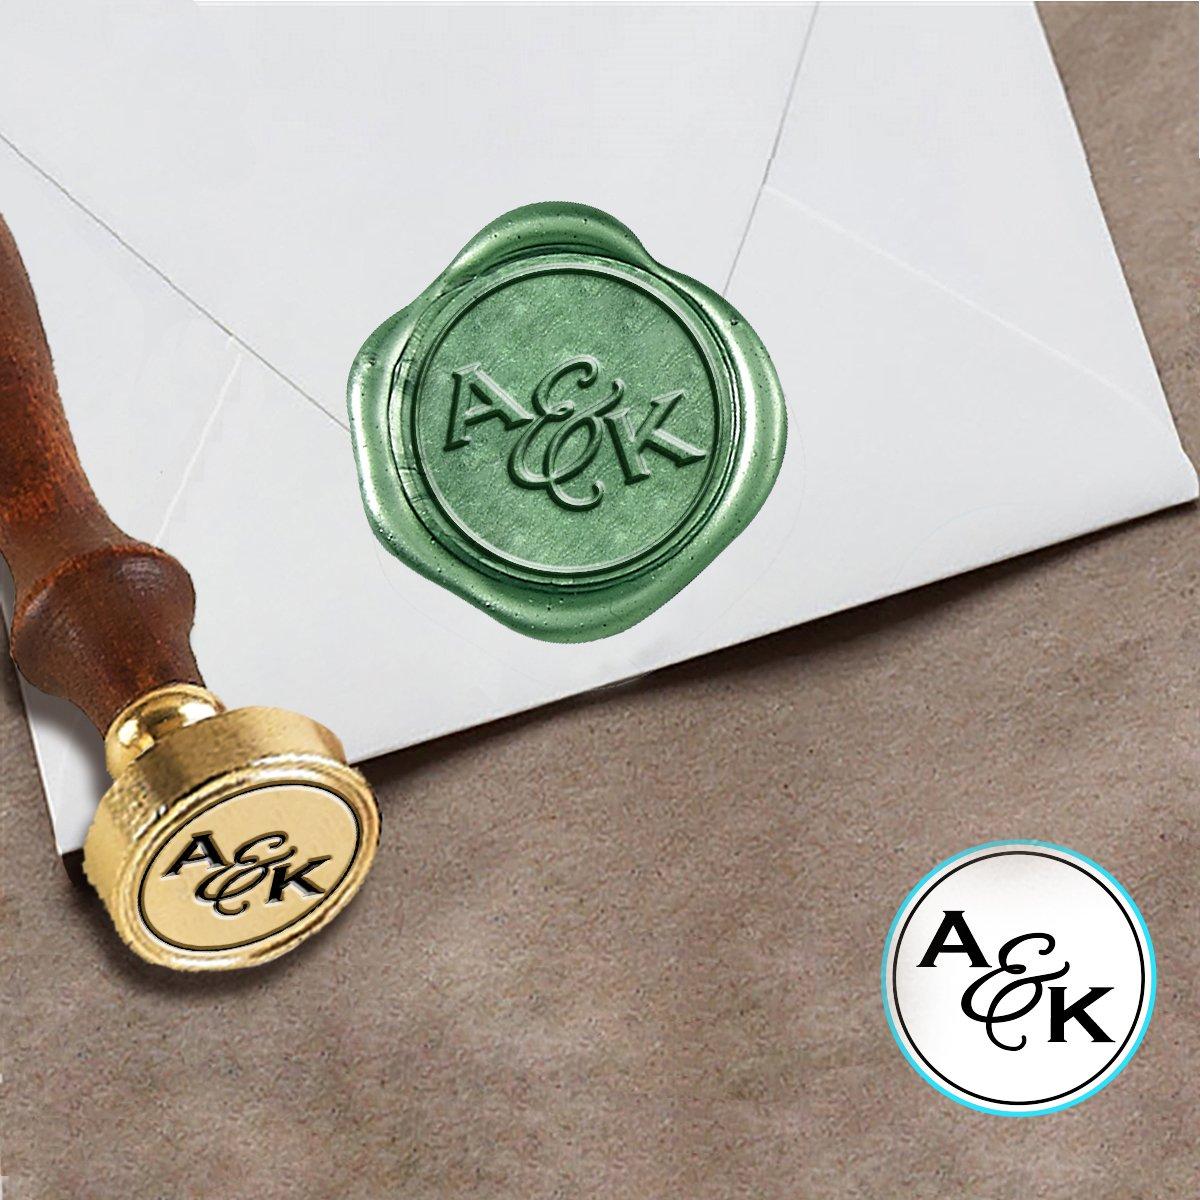 Wedding Couple Names//Initials Wedding Date /& mailable Sealing Wax Wedding Custom Wax Seal Stamp Kit